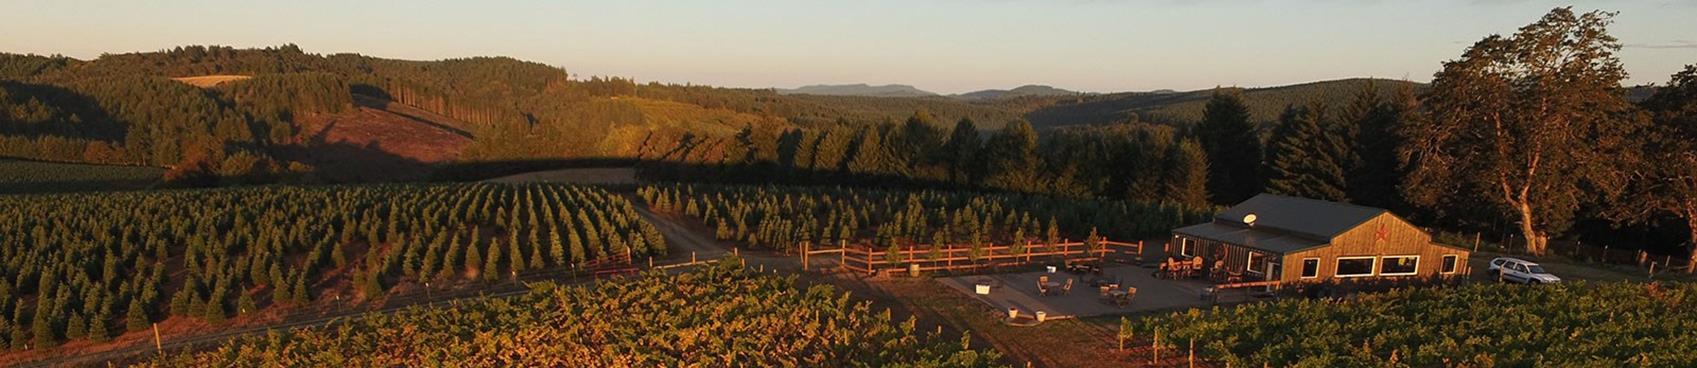 A image of J Wrigley Vineyards